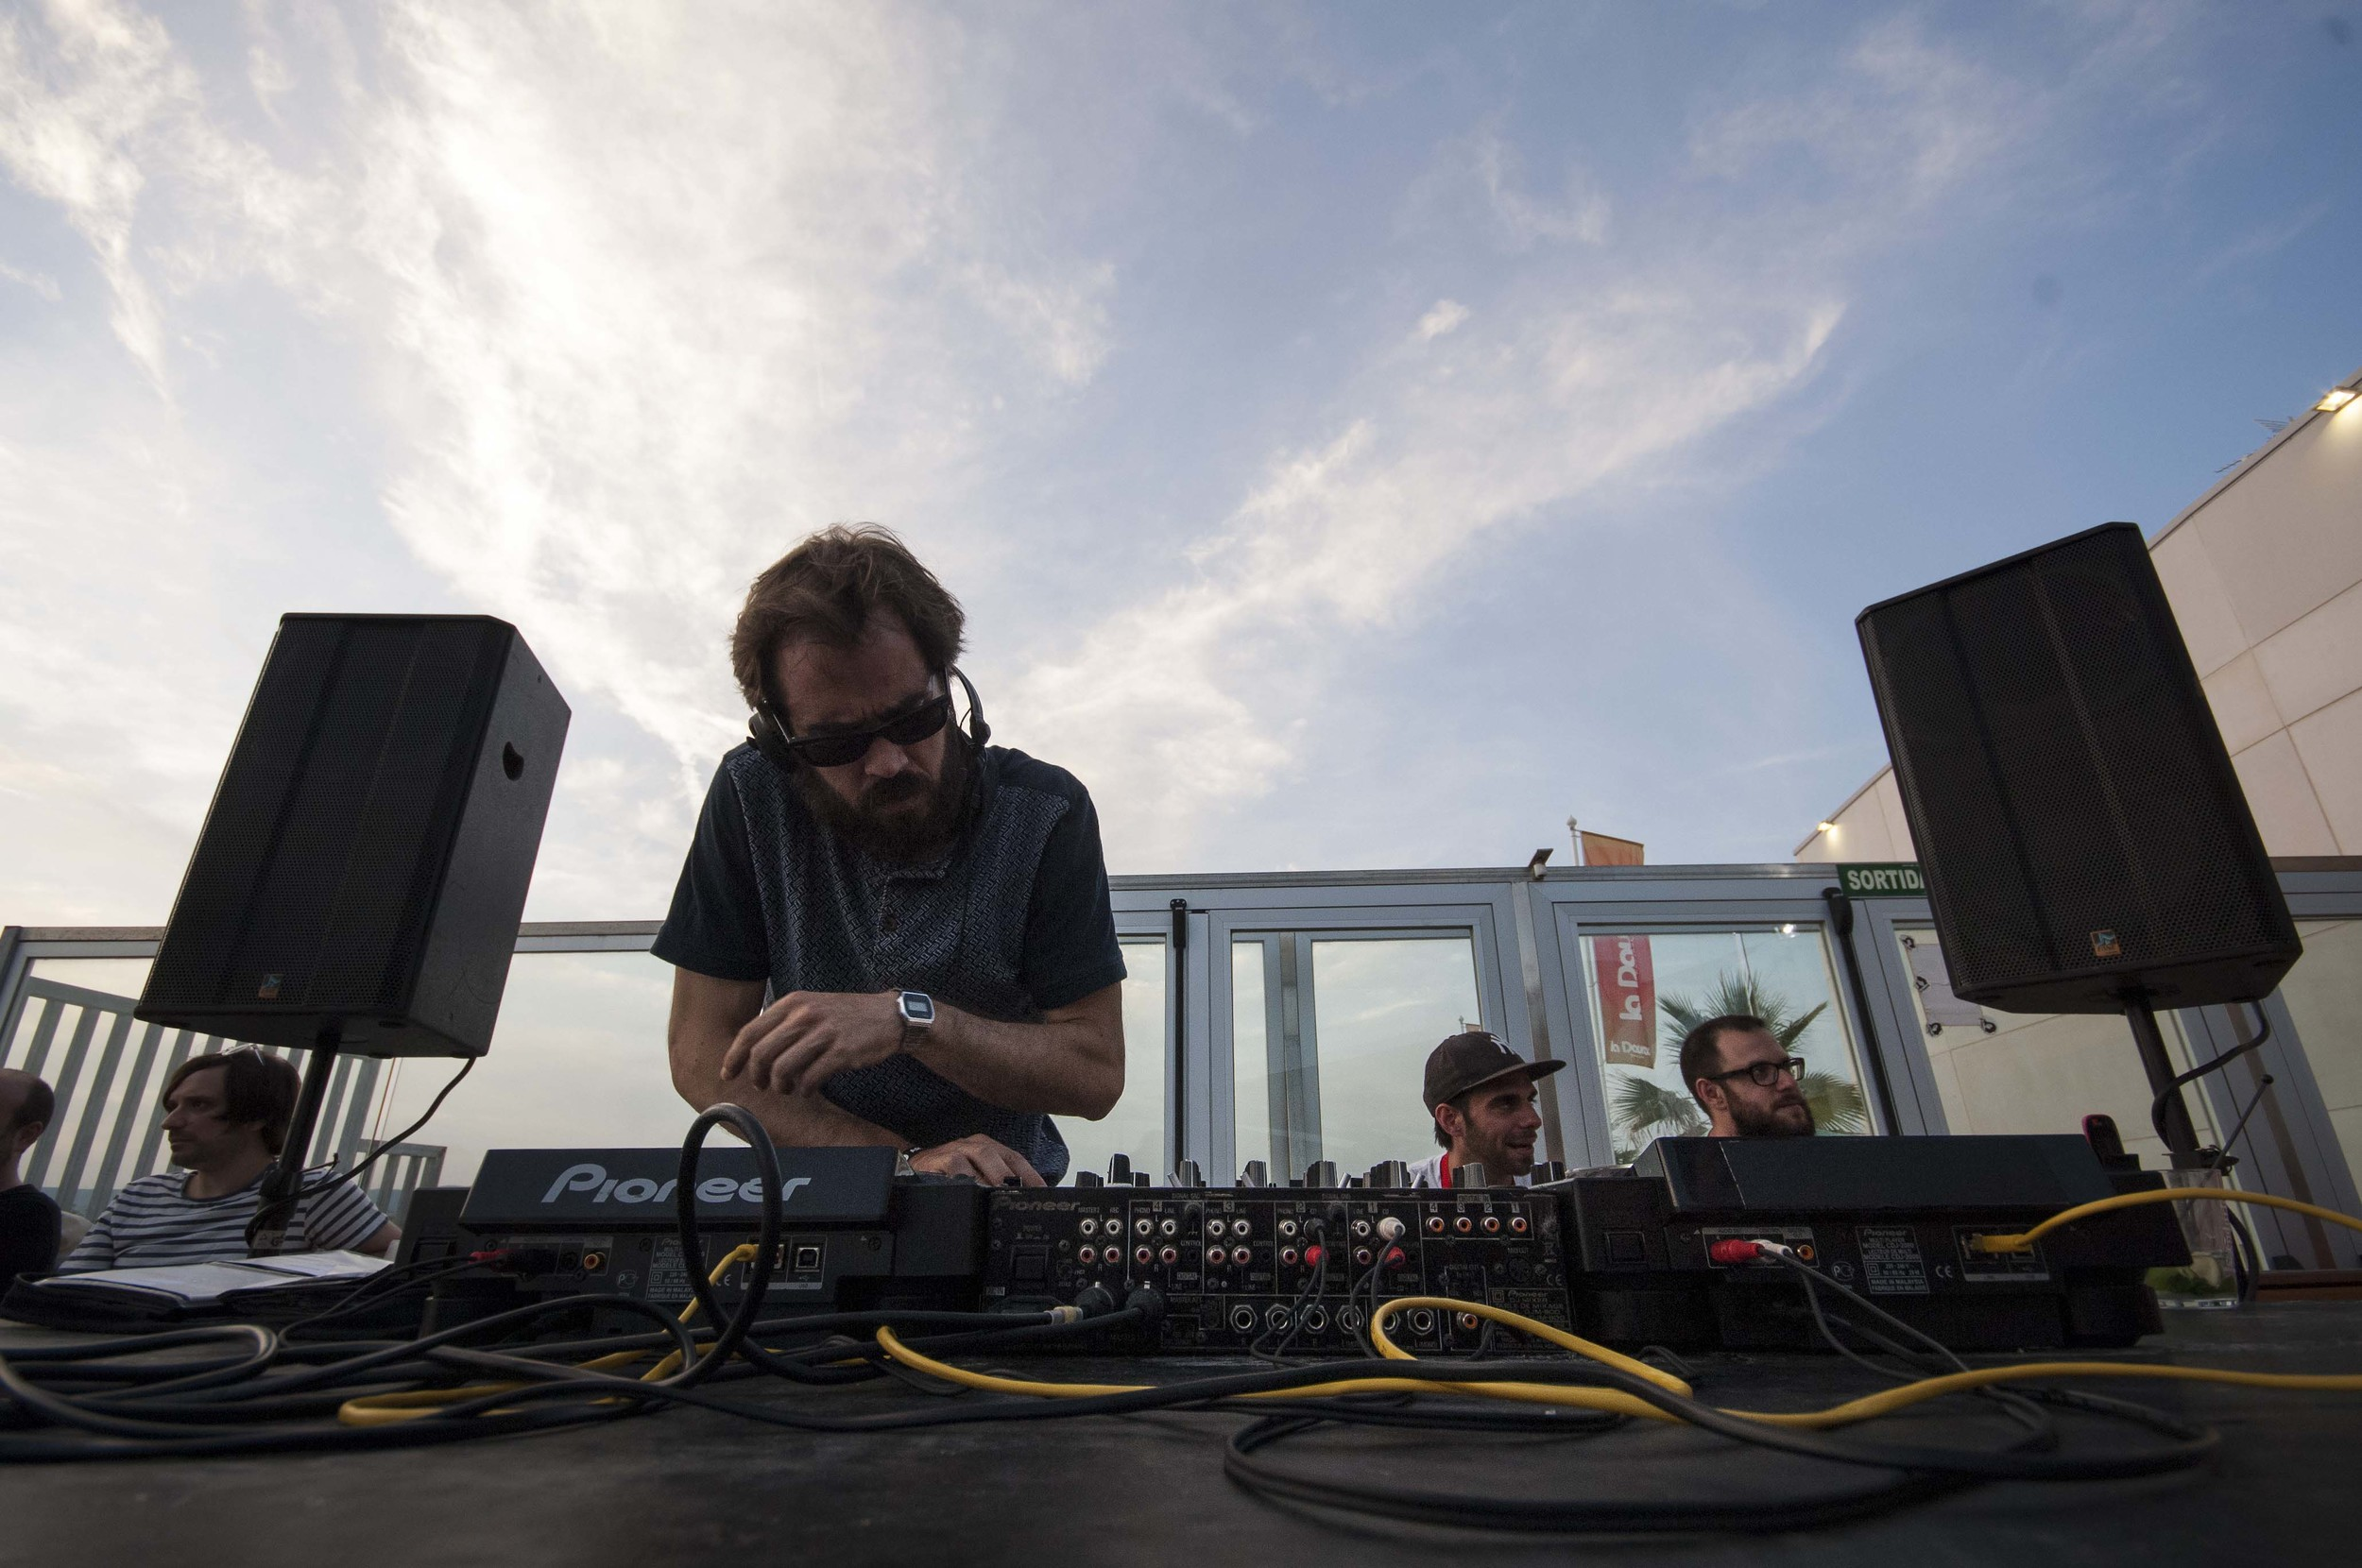 42_Vida Festival_Groove Roger_La Daurada.JPG